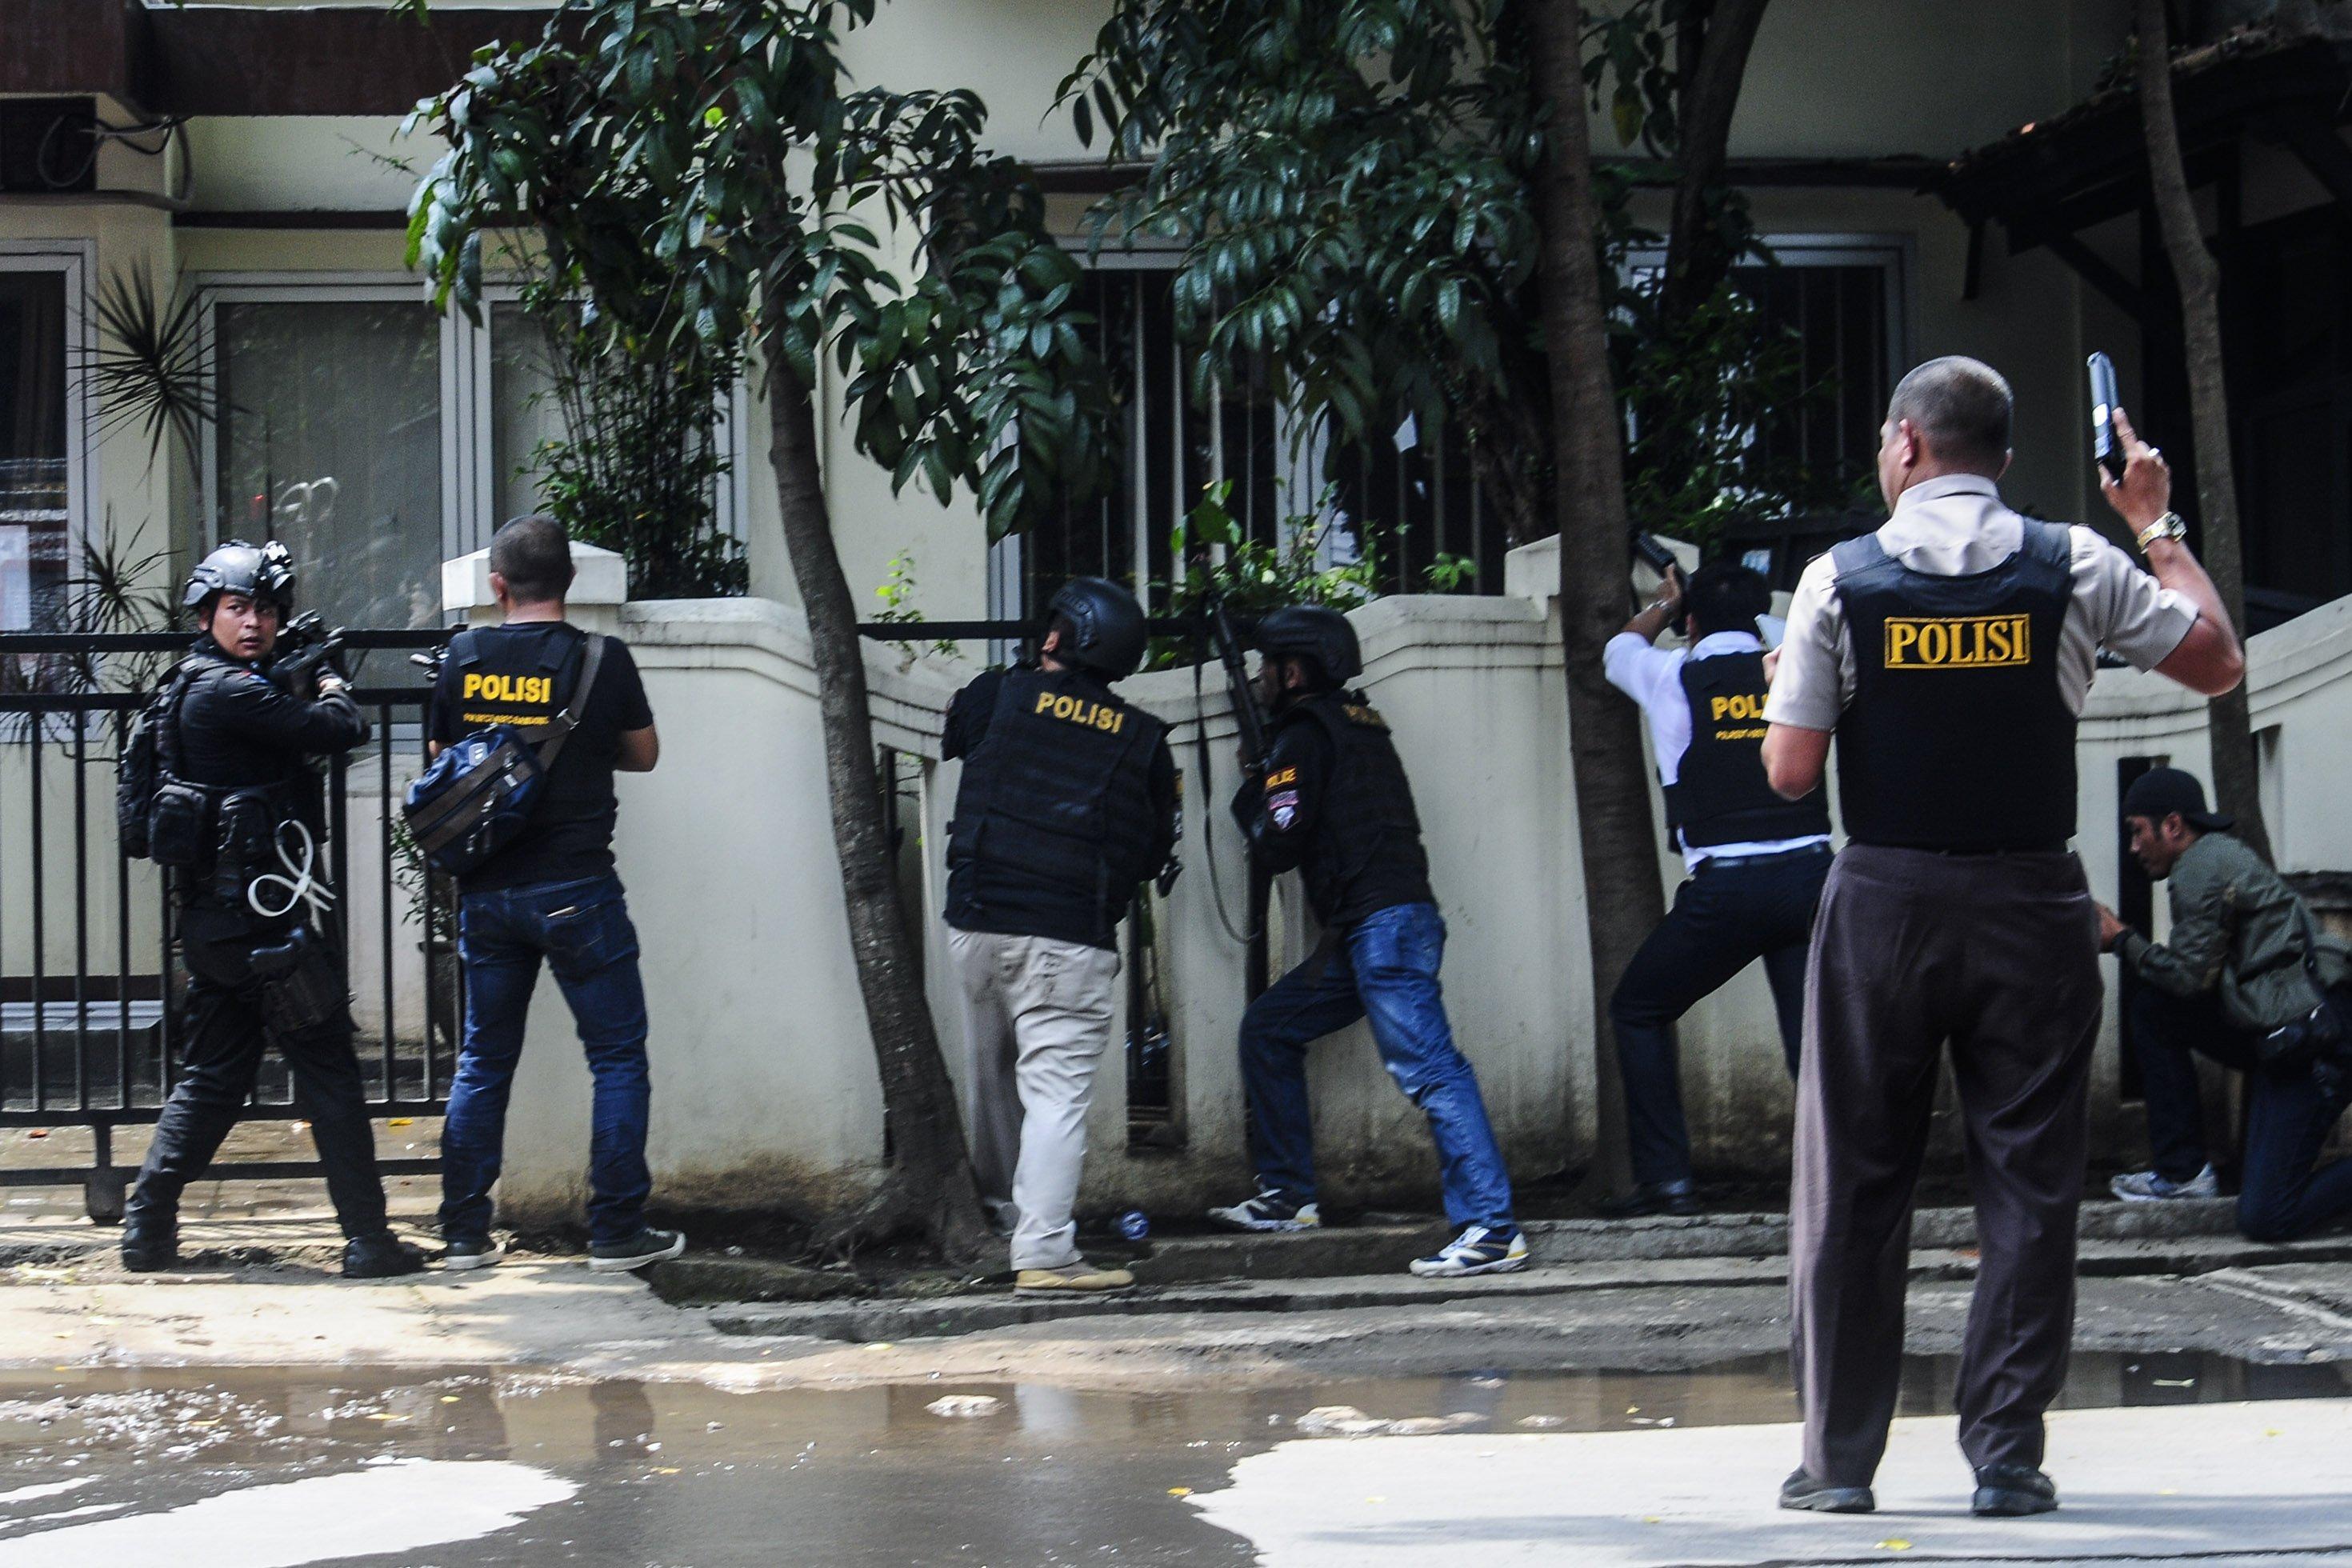 Kepolisian berhasil menangkap seorang pria terduga teroris yang meledakkan benda yang diduga